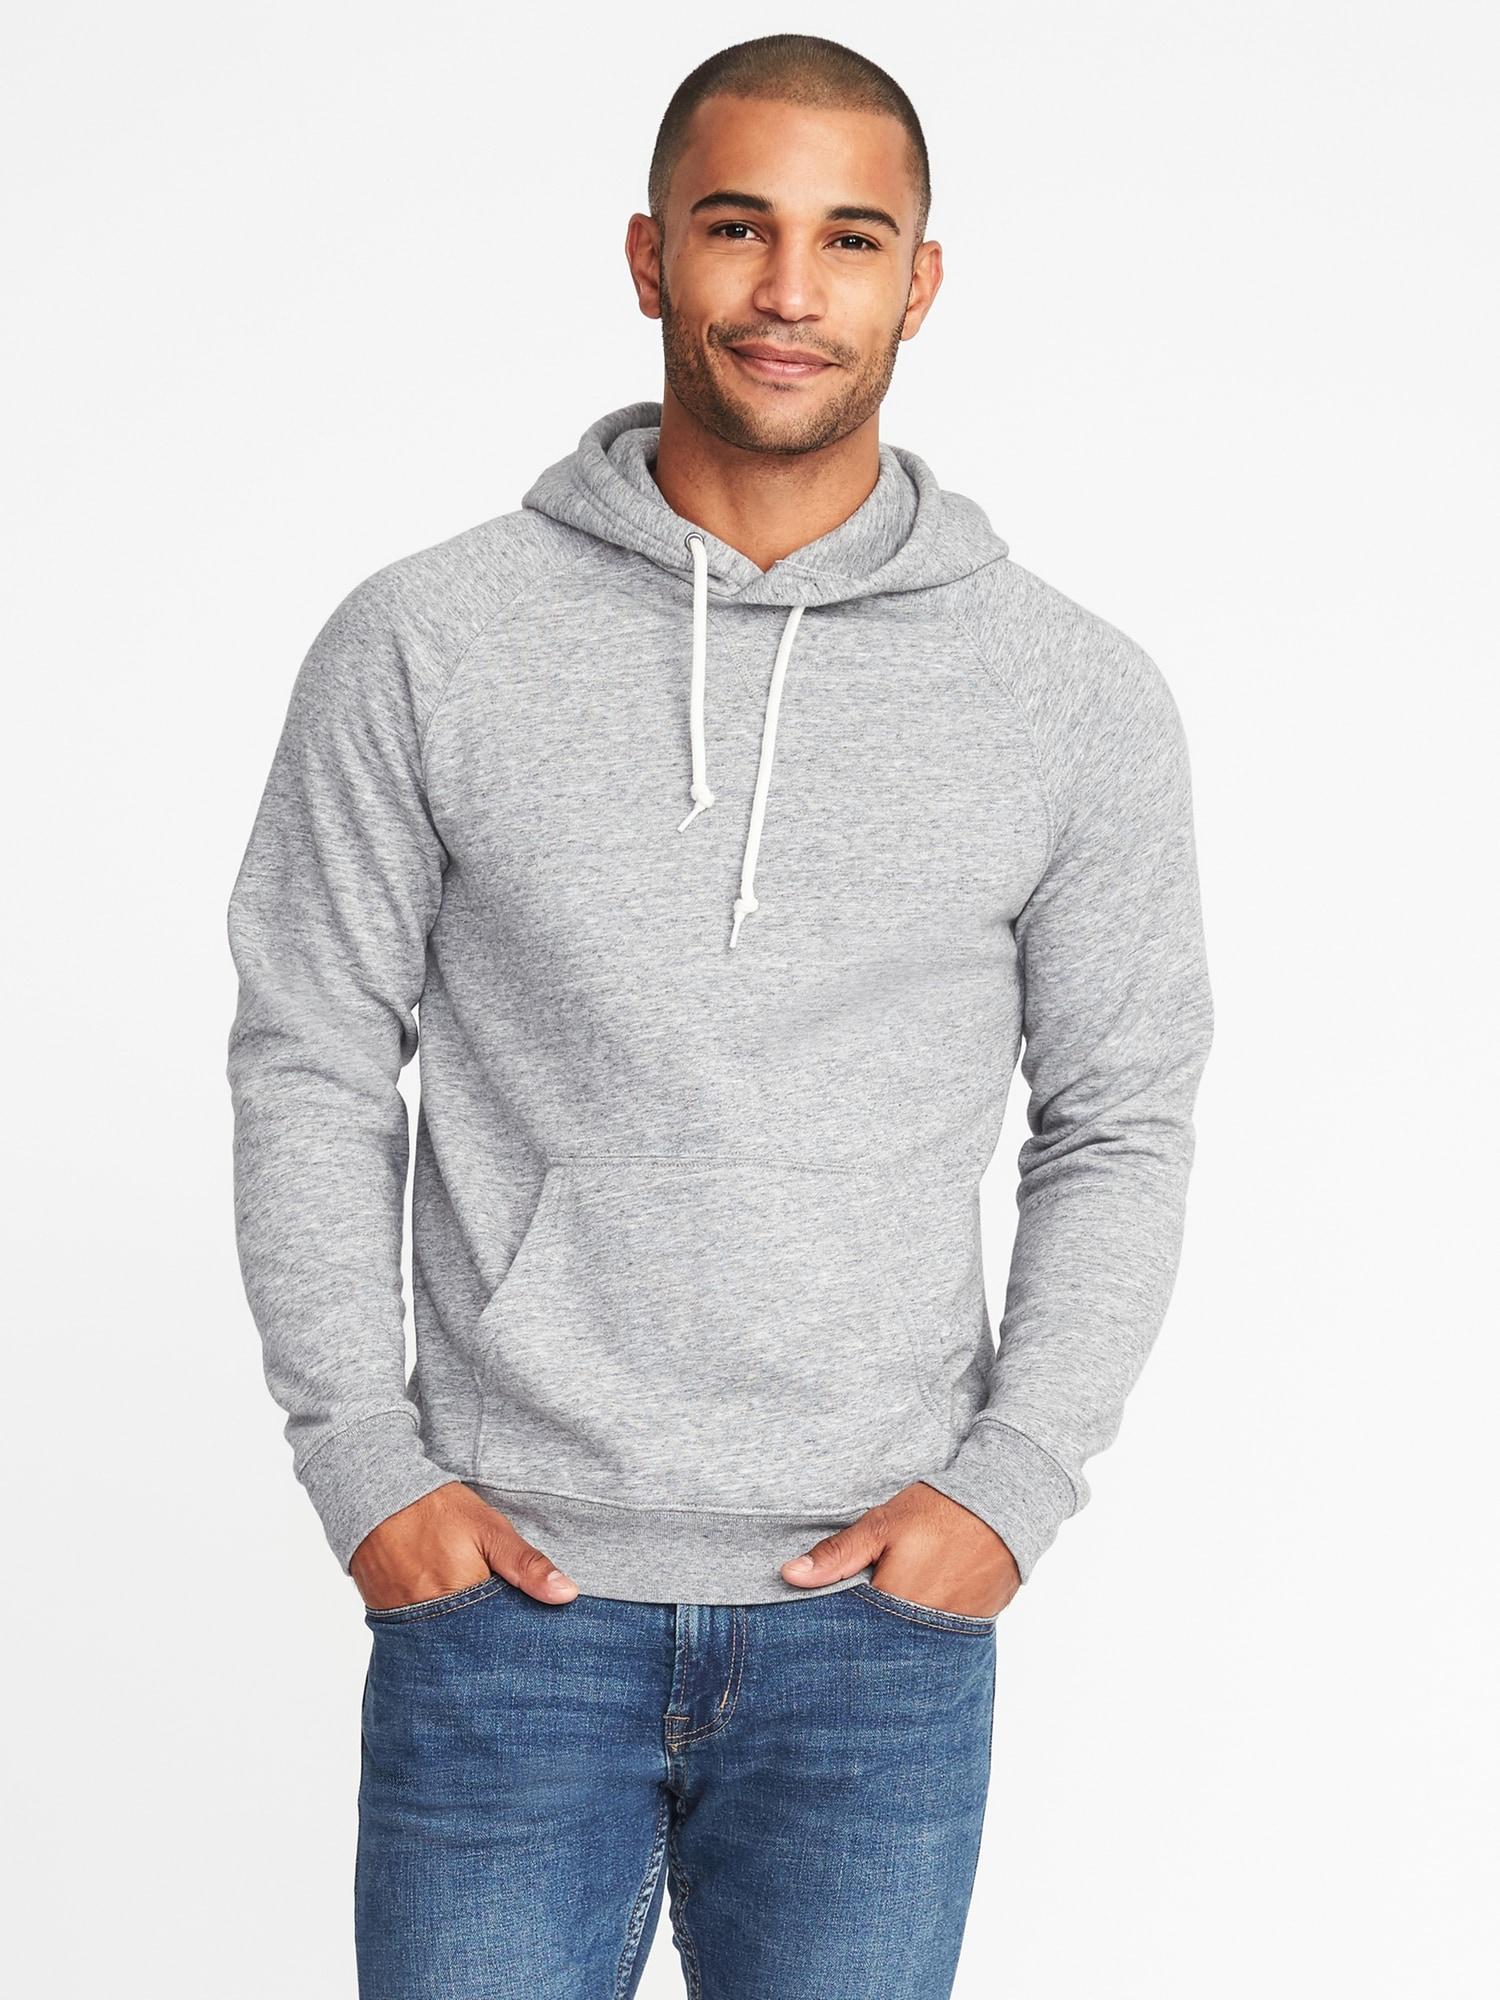 Mens Classic Pullover Hoodie Sweatshirt,How to Pick up Girls Print